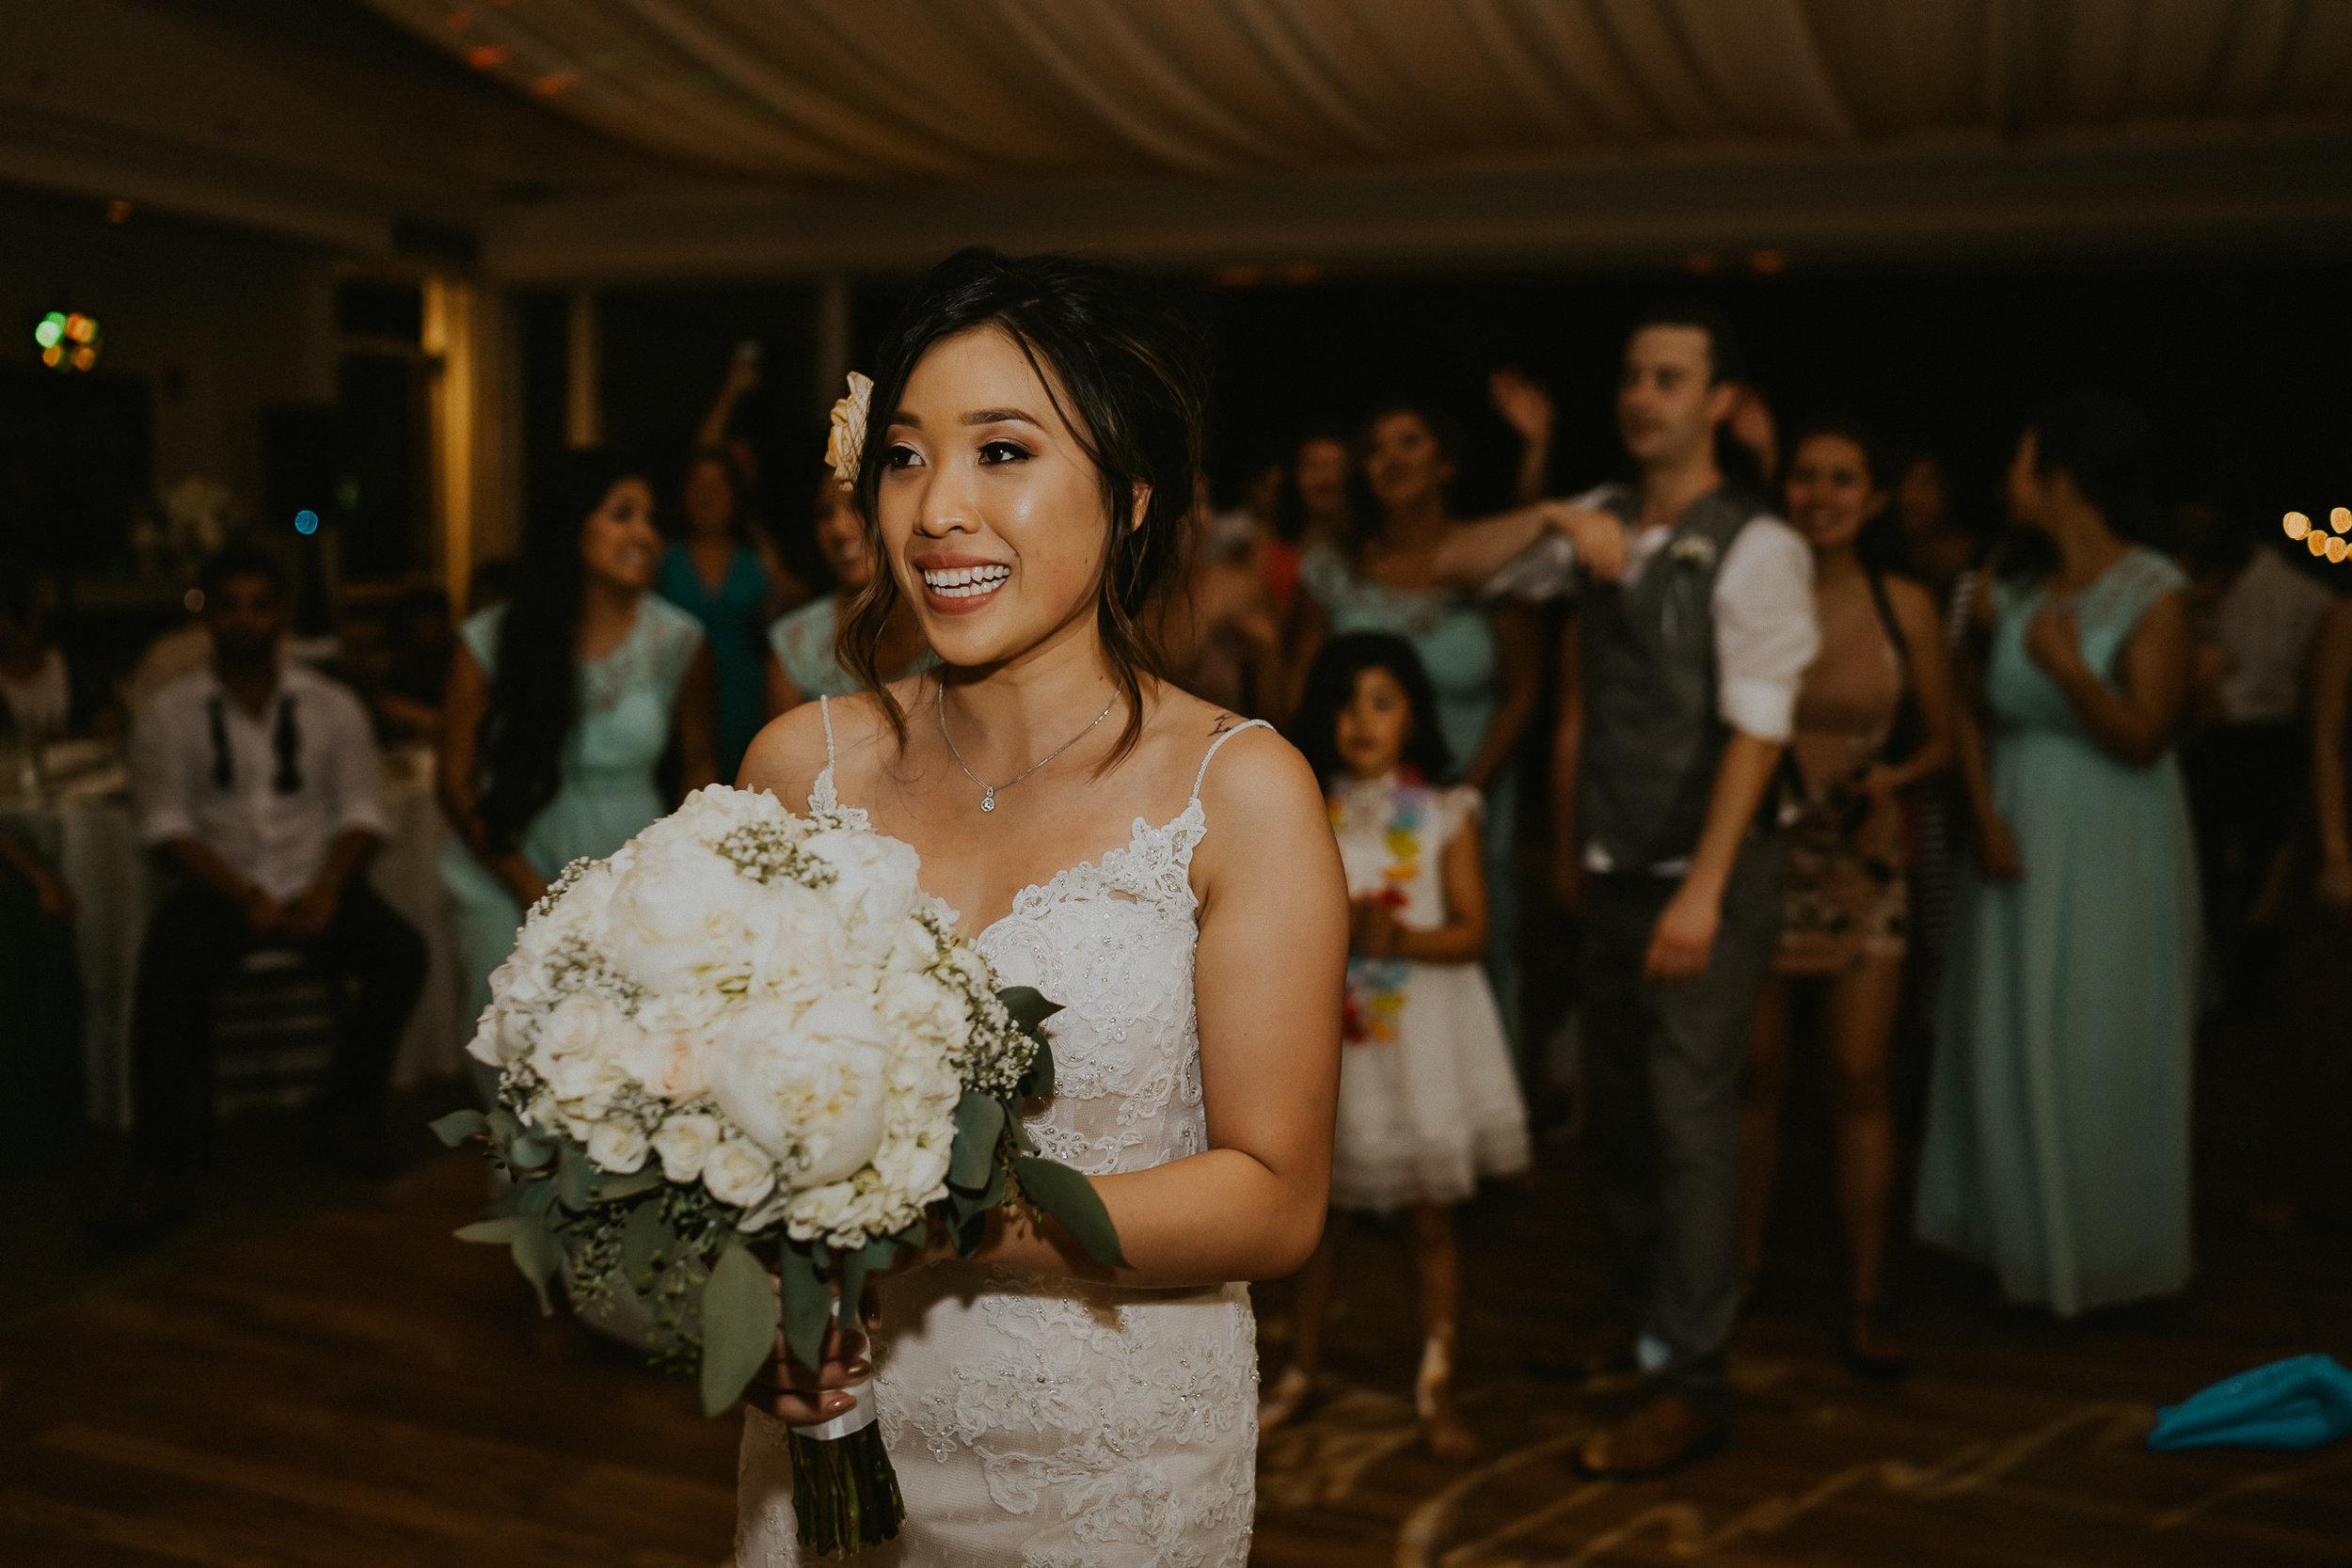 Maui_Destination_wedding_Alfred_Tang-101.jpg